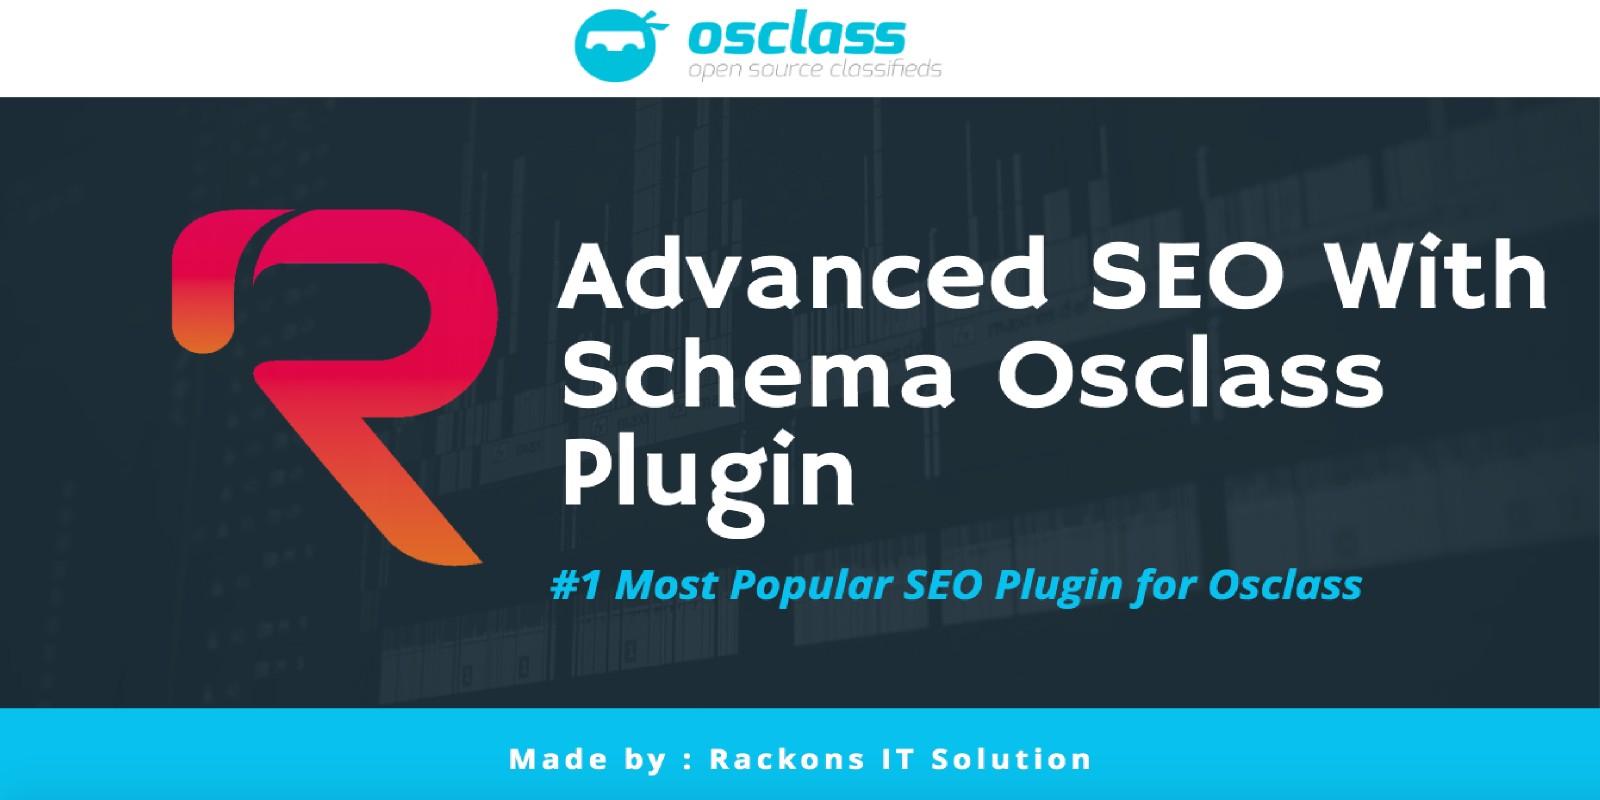 Advanced SEO With Schema Osclass Plugin